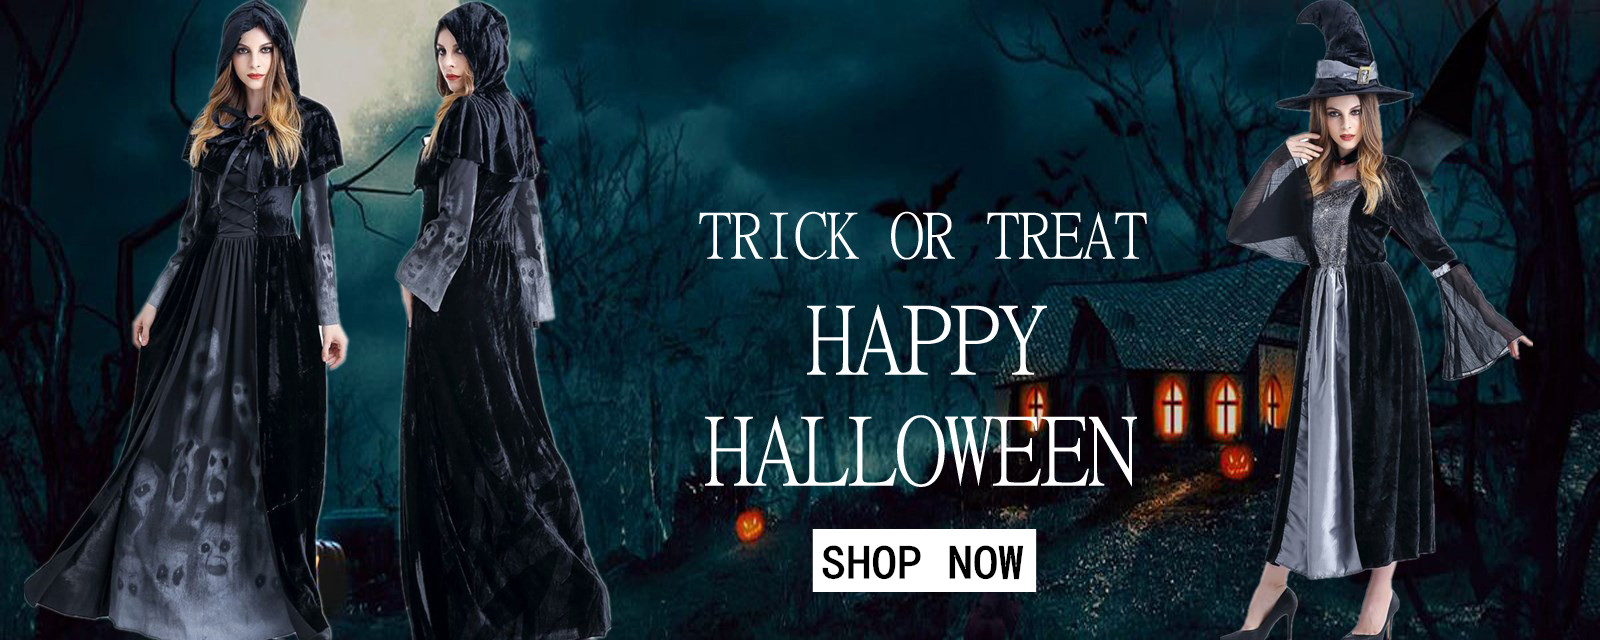 holidayHalloween Witch Long Costume Set